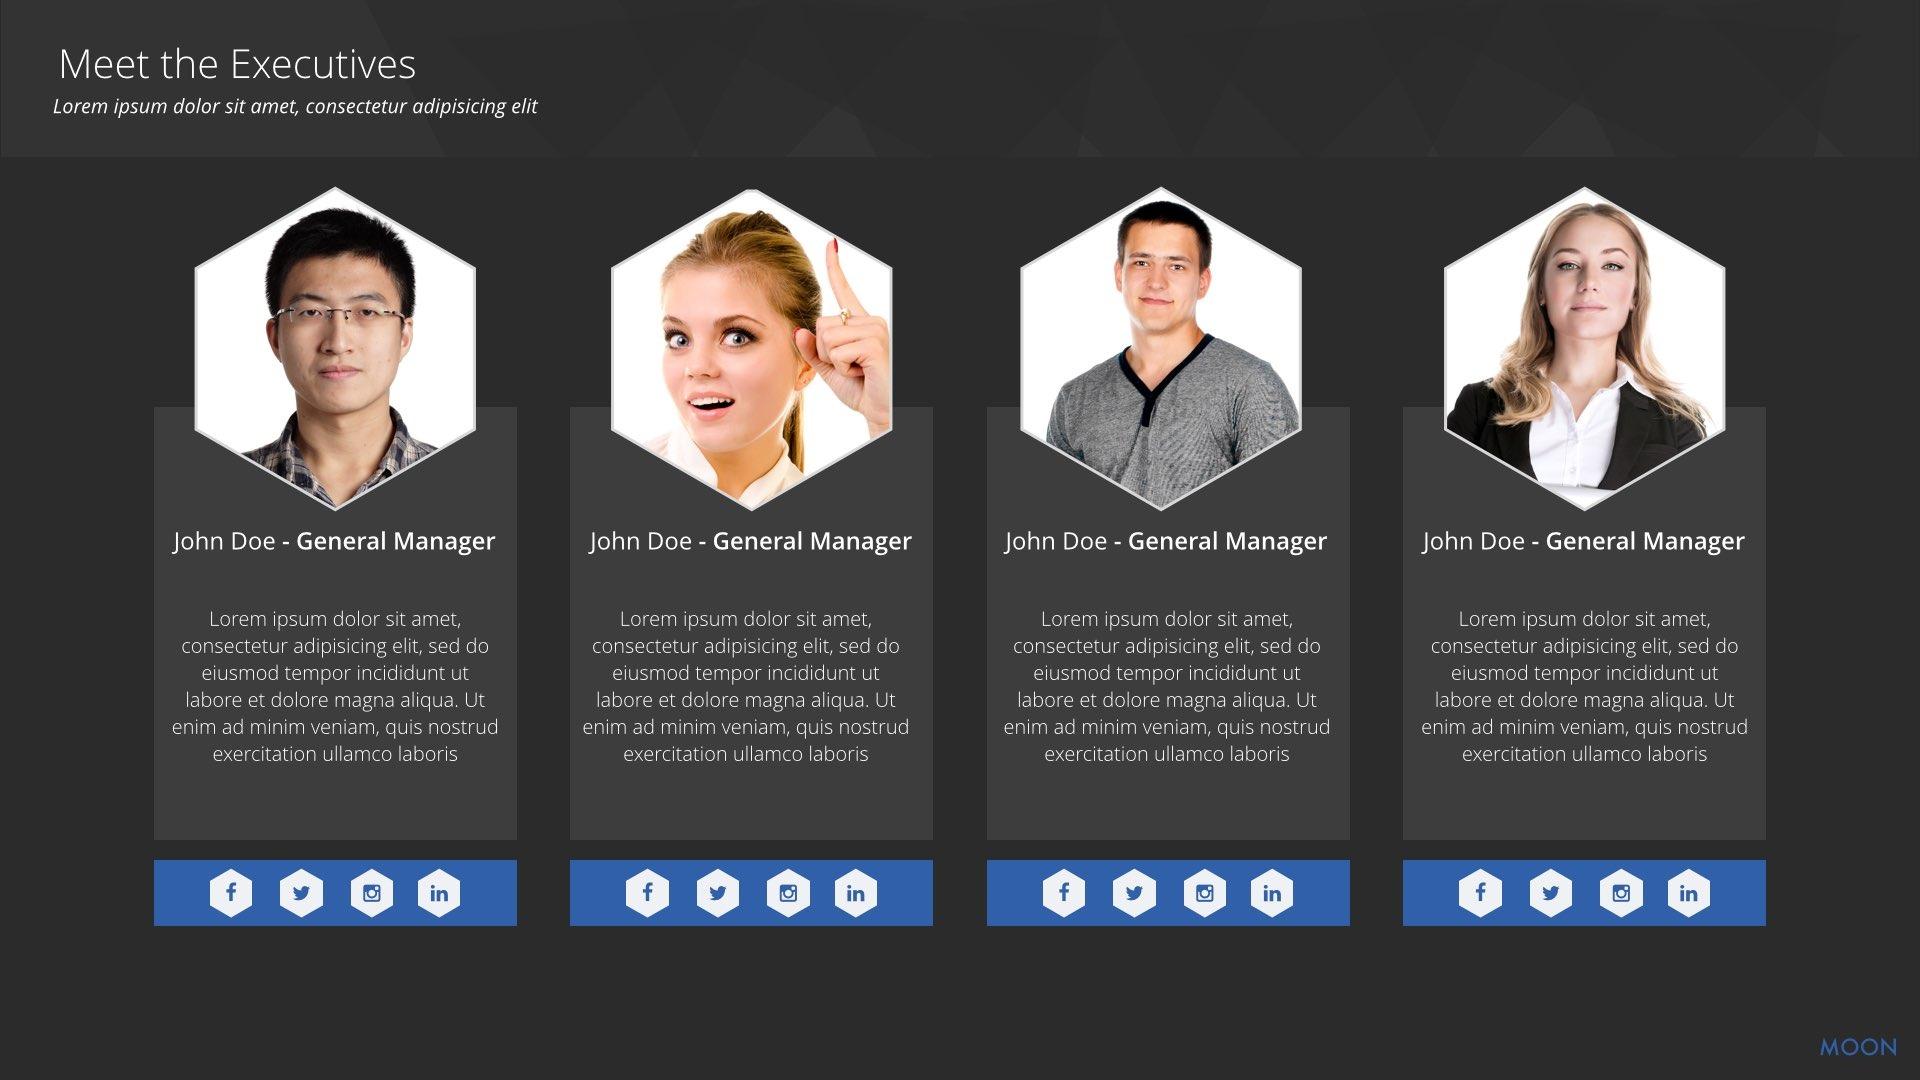 MOON Keynote Presentation Template by HexagonPixel   GraphicRiver